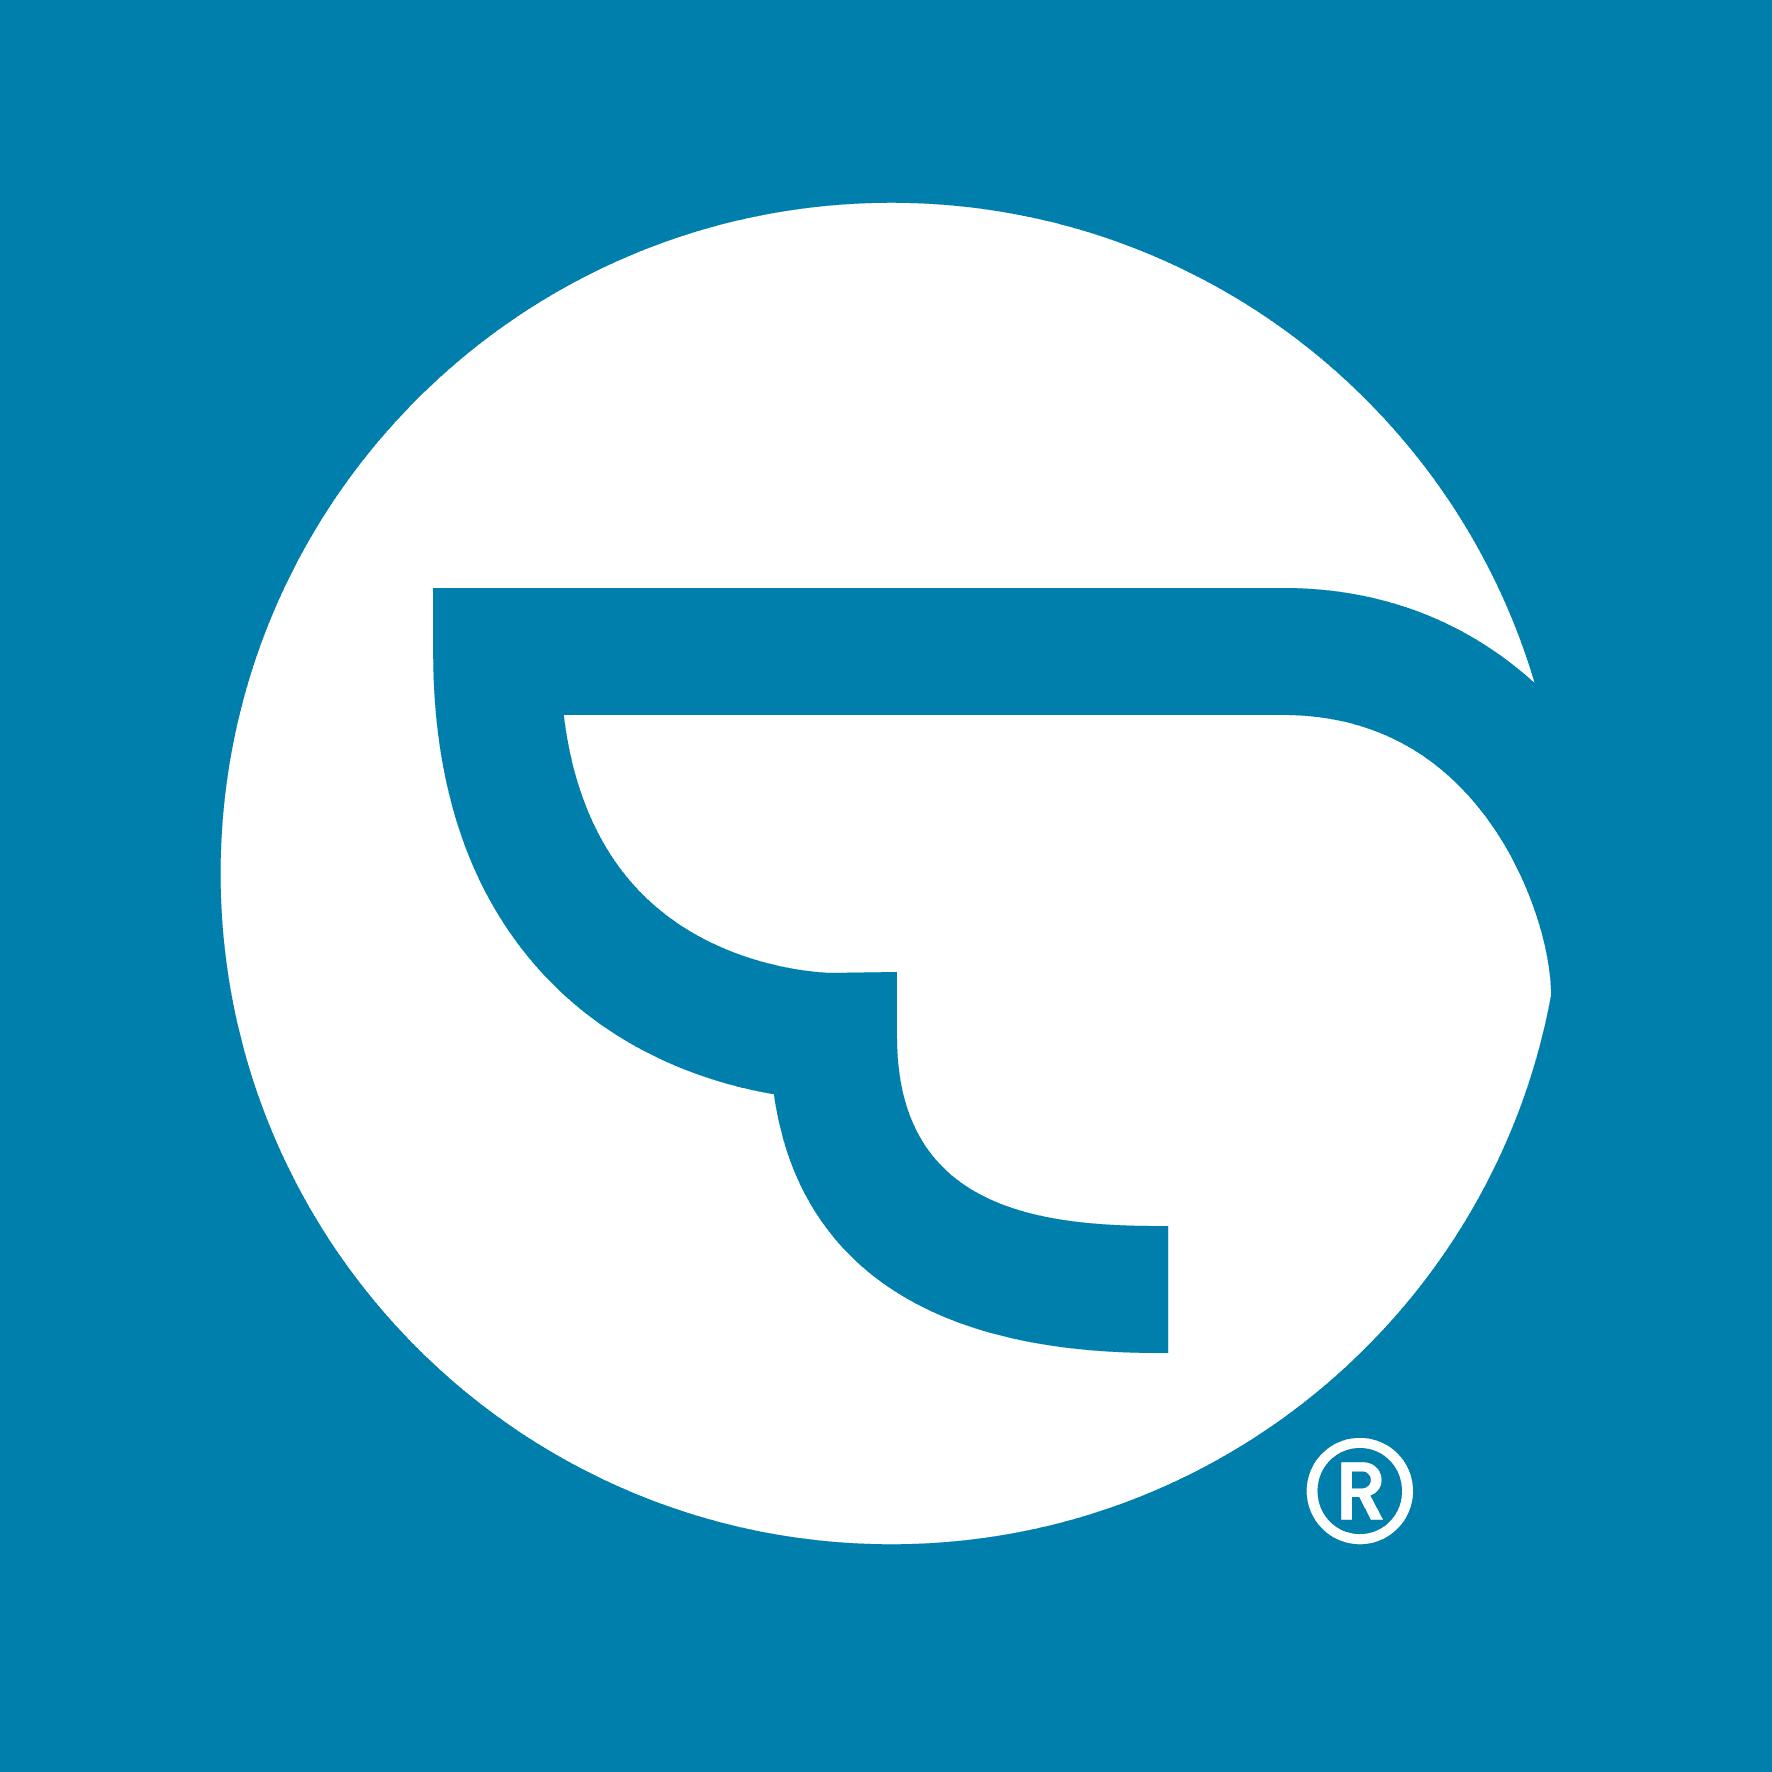 Airtasker | Crunchbase